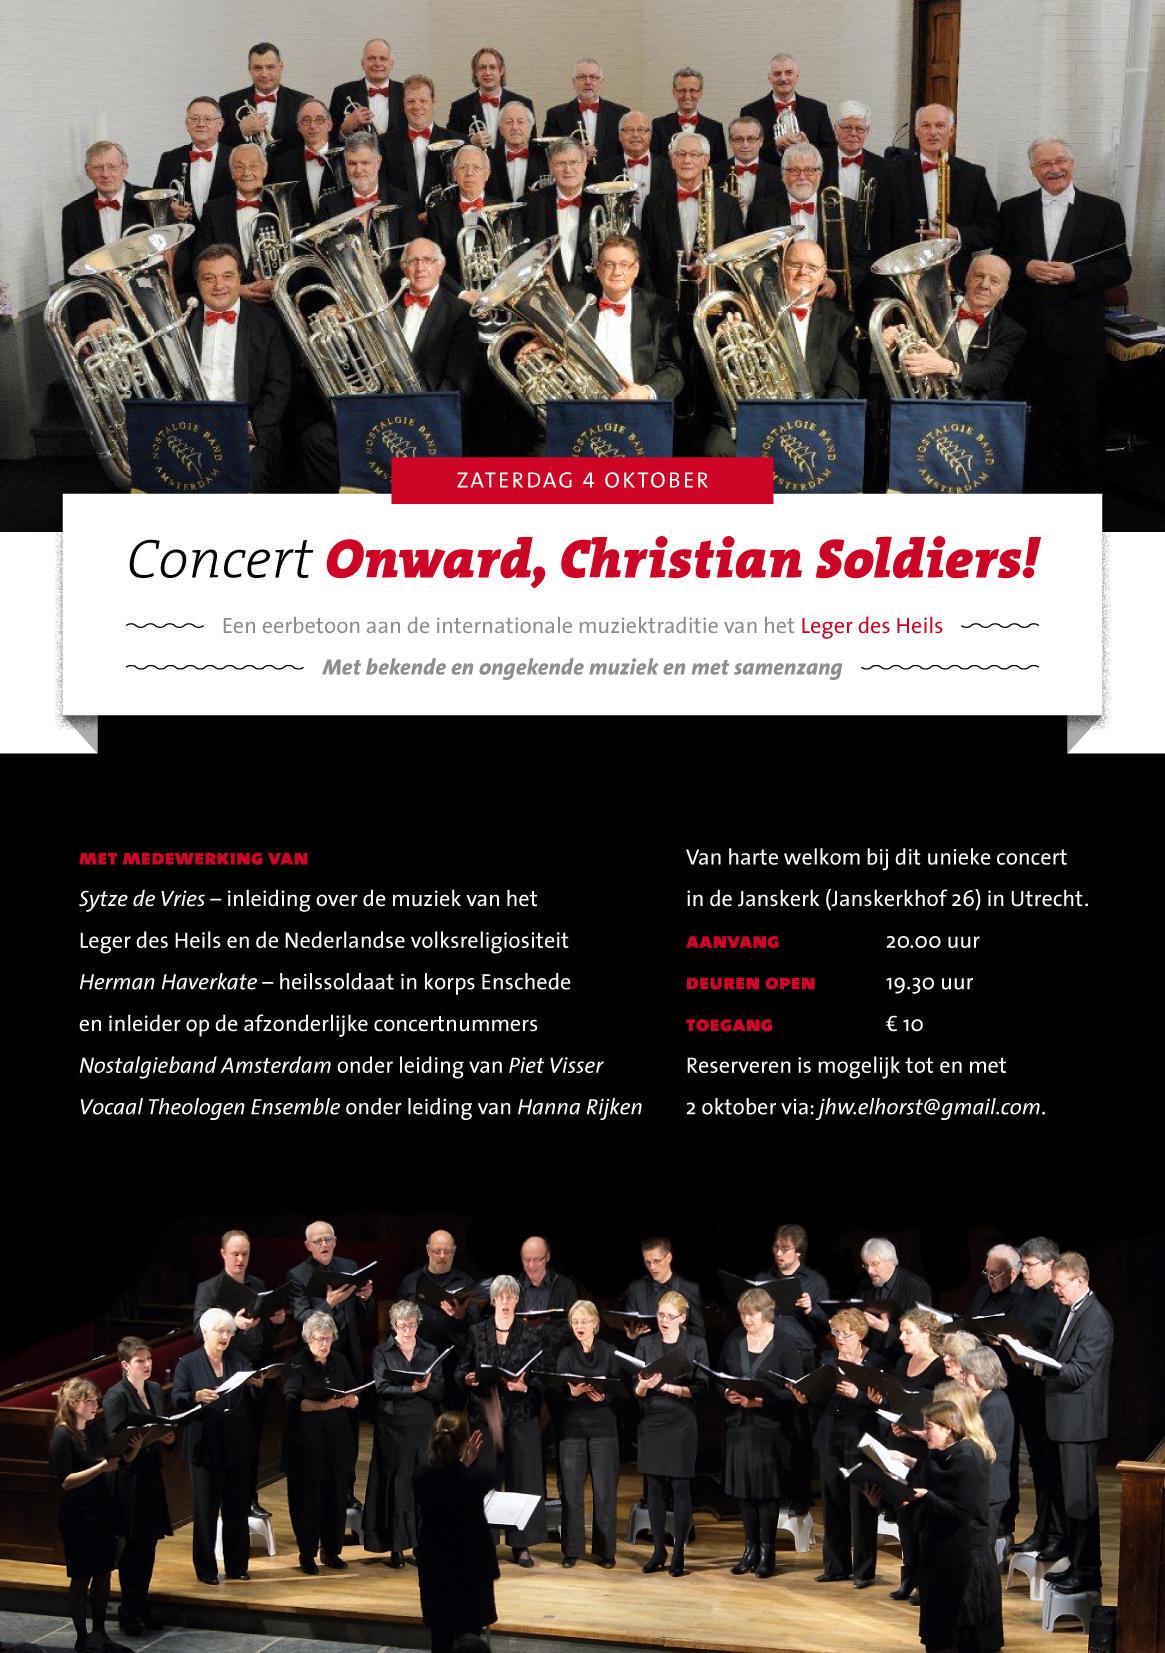 concertflyer OCS 4 oktober 2014